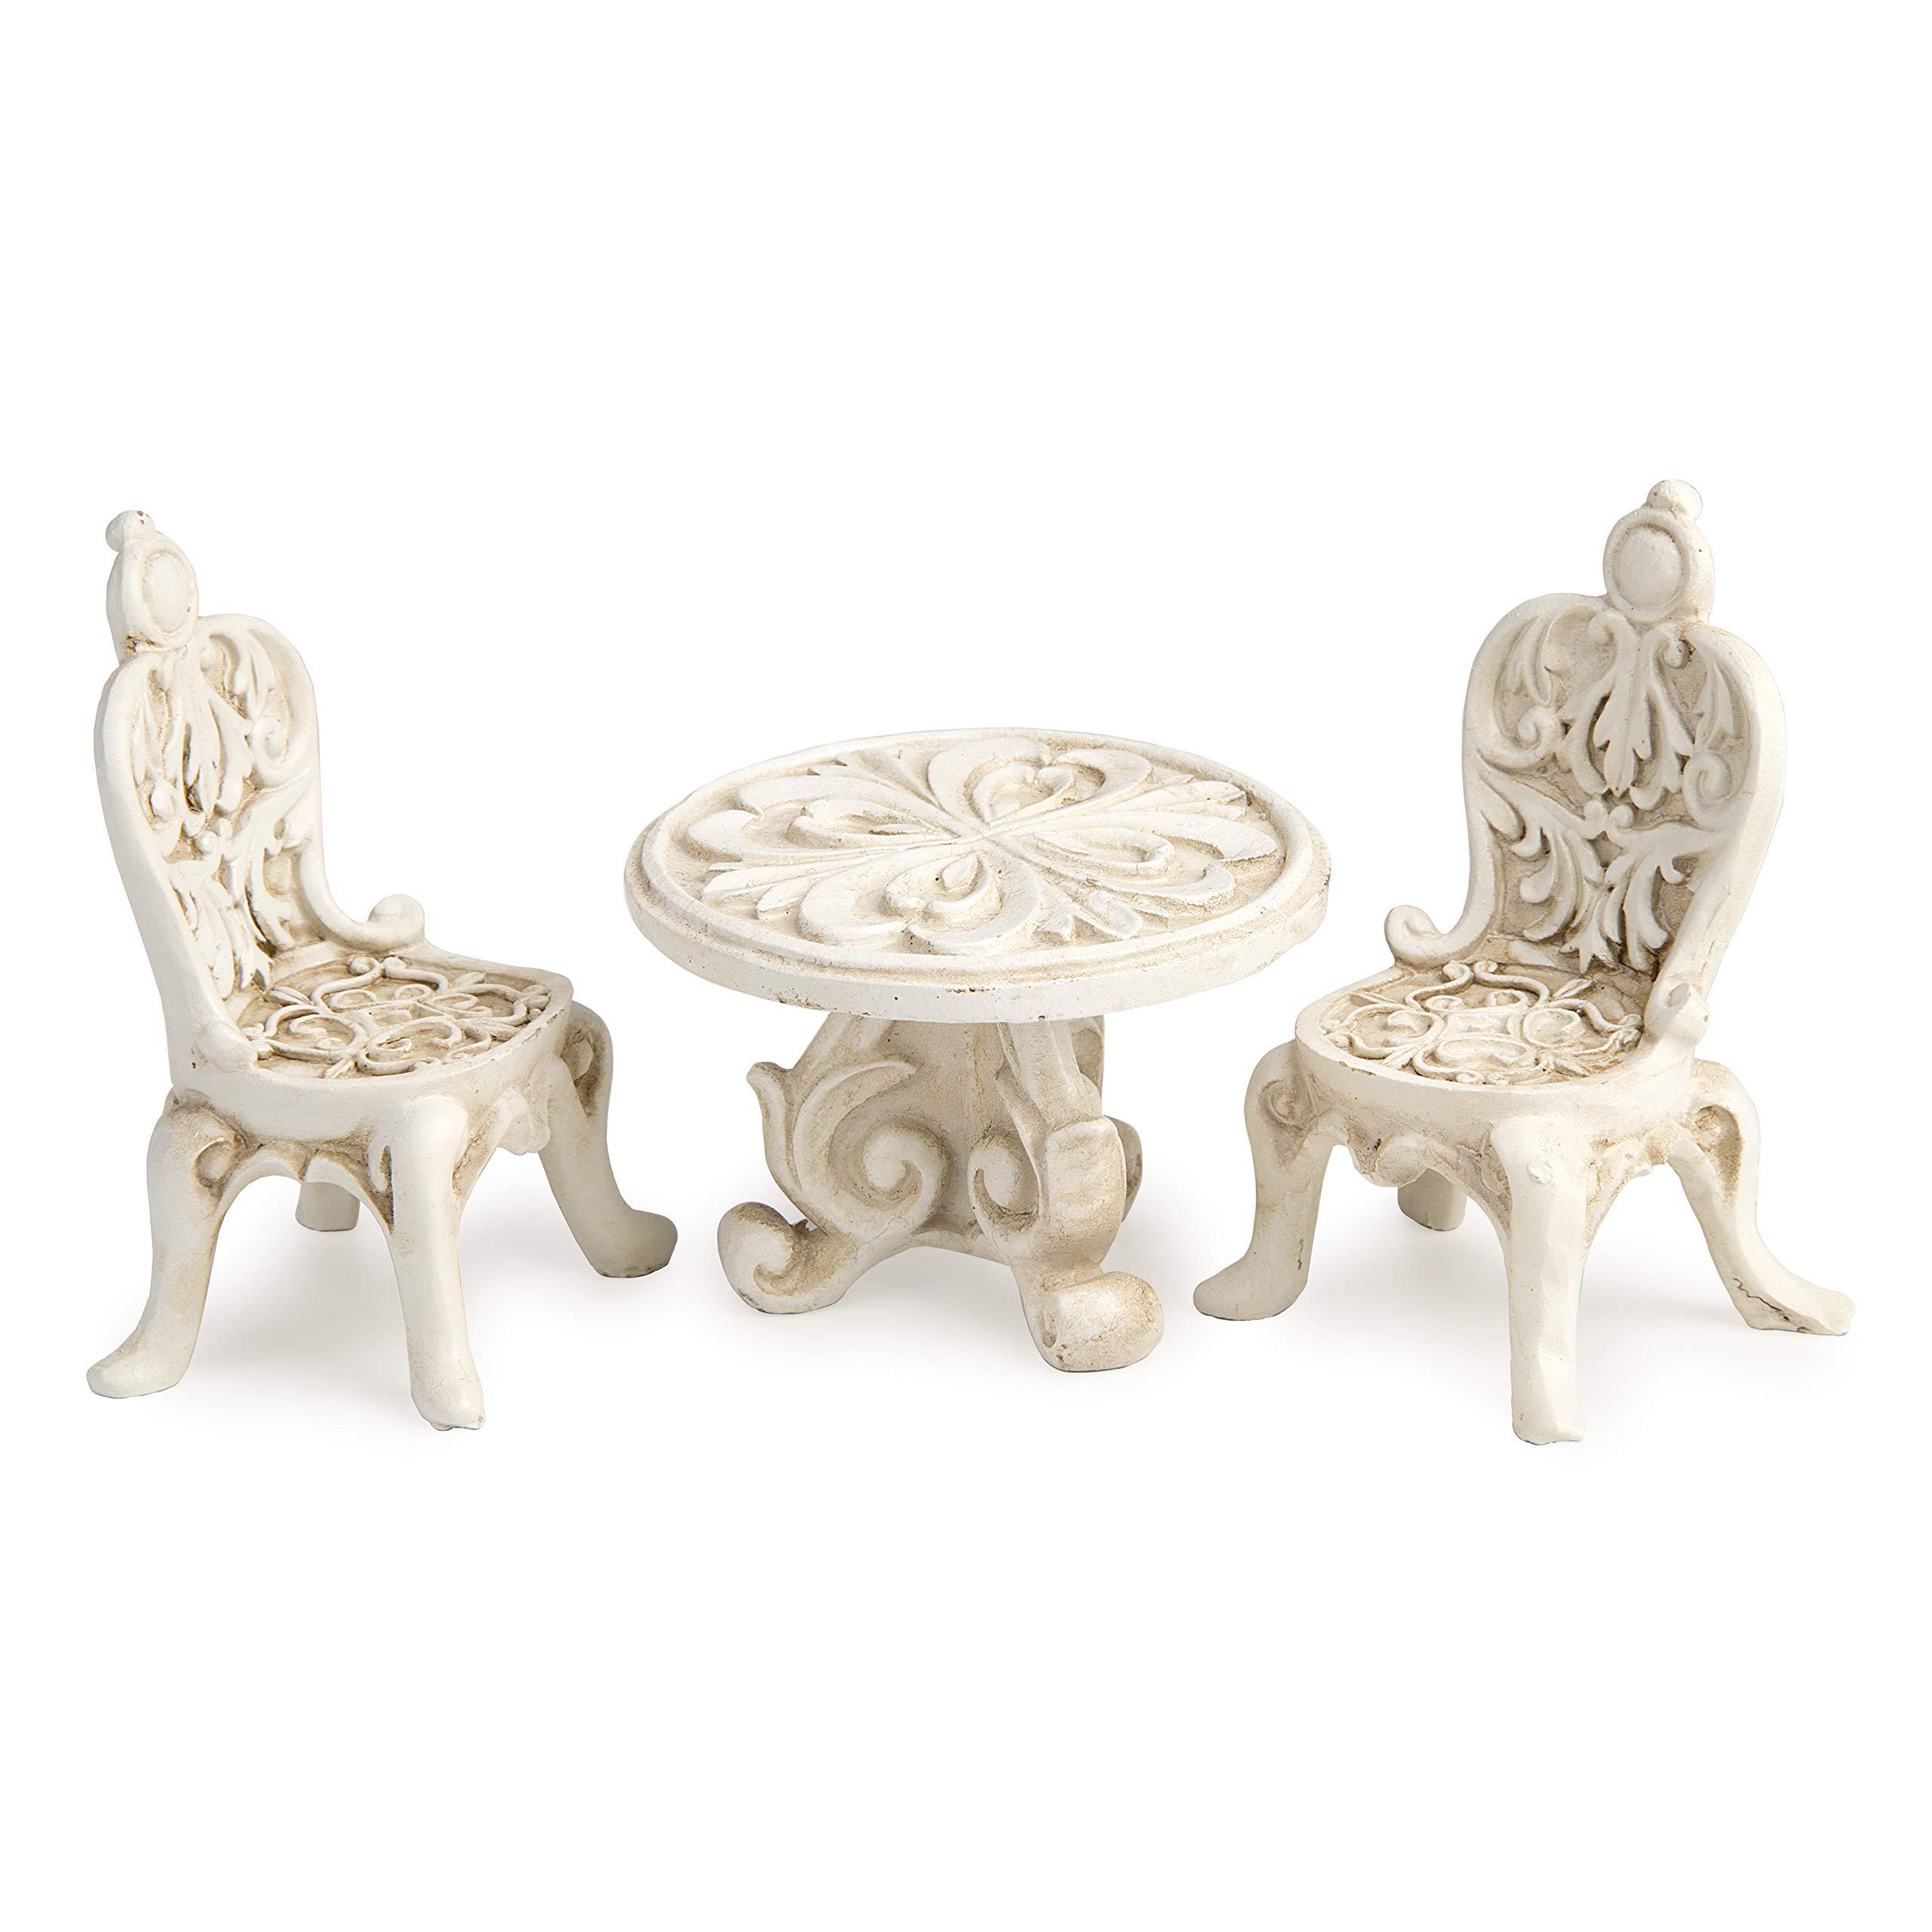 Darice Q78140361B Mini Table Chair Fancy Resin